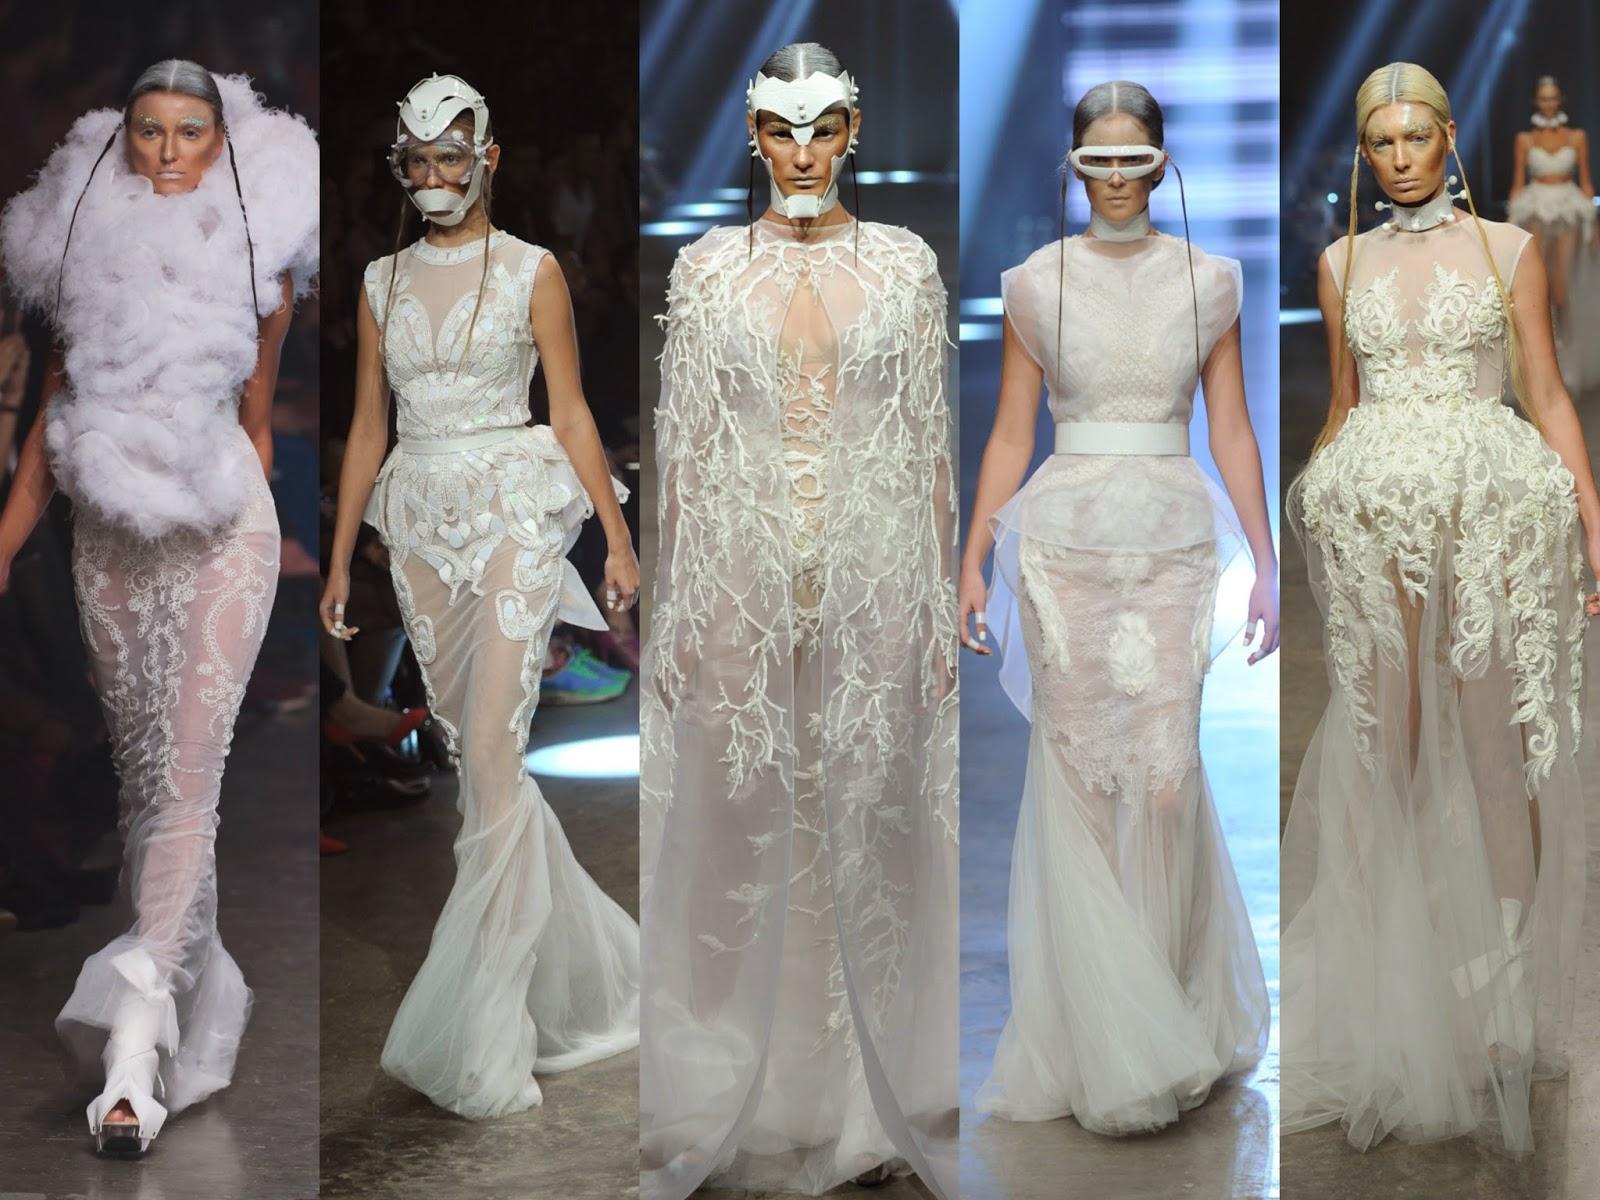 fashion, style, fashion show, fashion forward, fashion forward season 4, ffwd, ffwddxb, the style sorbet, dubai, my dubai, dubai fashion blog, fashion blog, blogger, style blogger, fashion blogger, dubai fashion blogger, amato